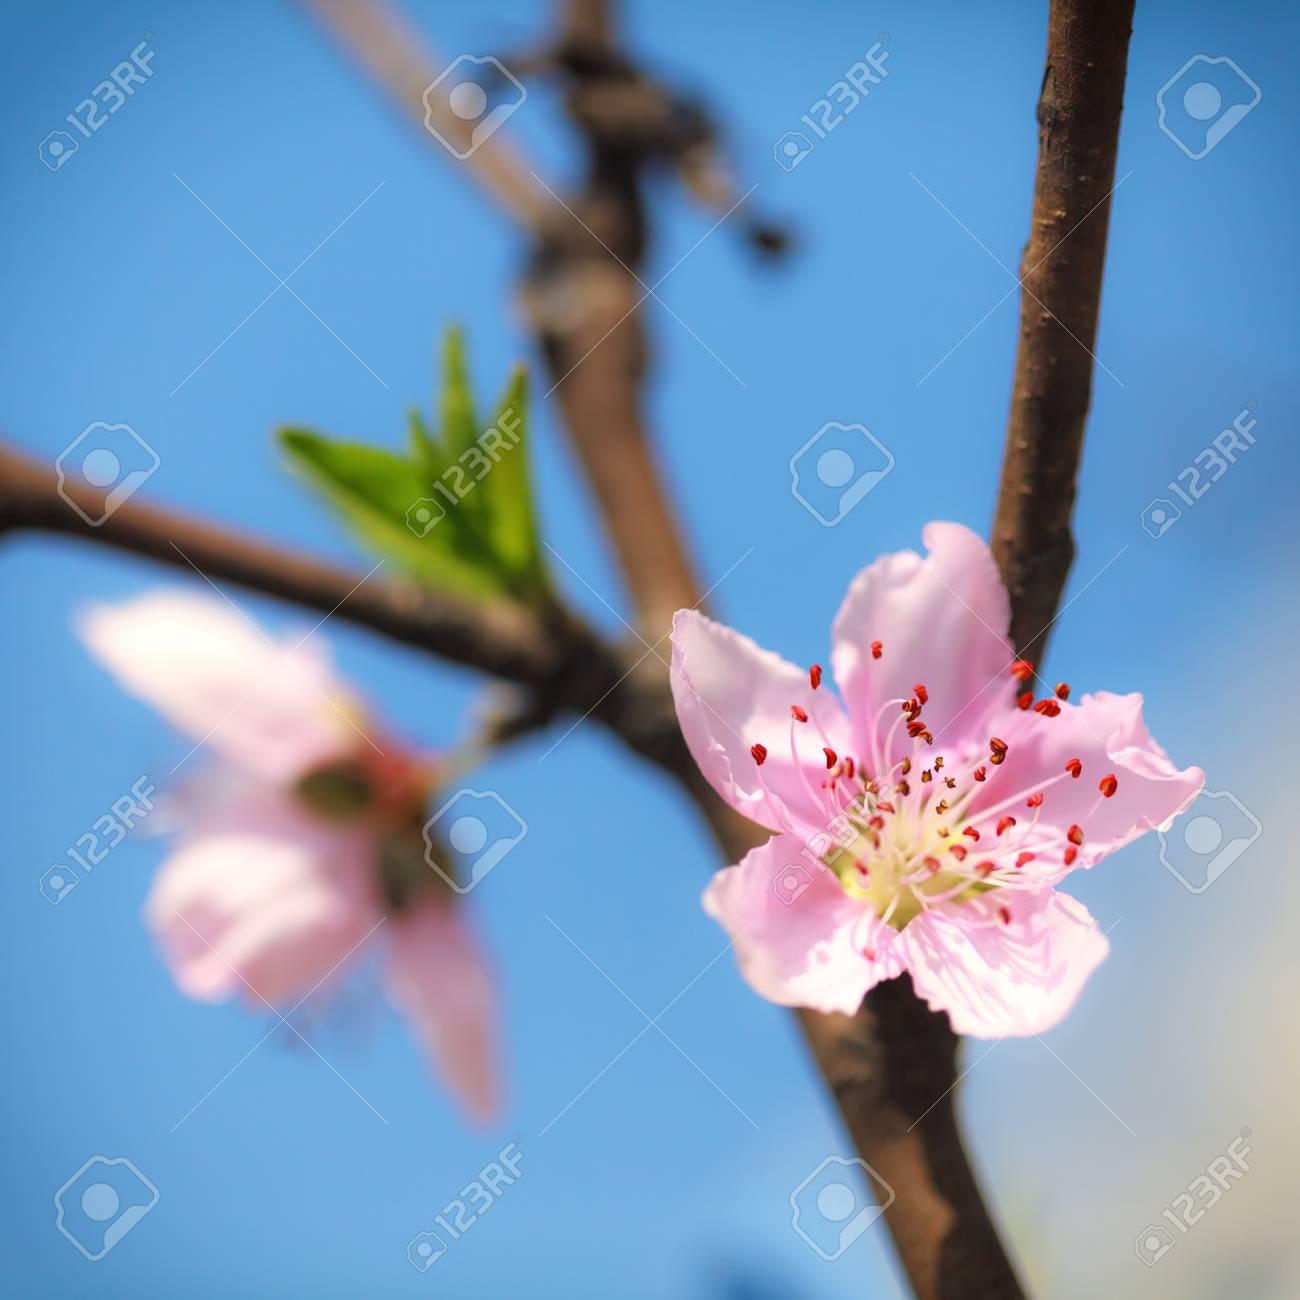 Pink plum blossoms under blue sky Stock Photo - 18095937